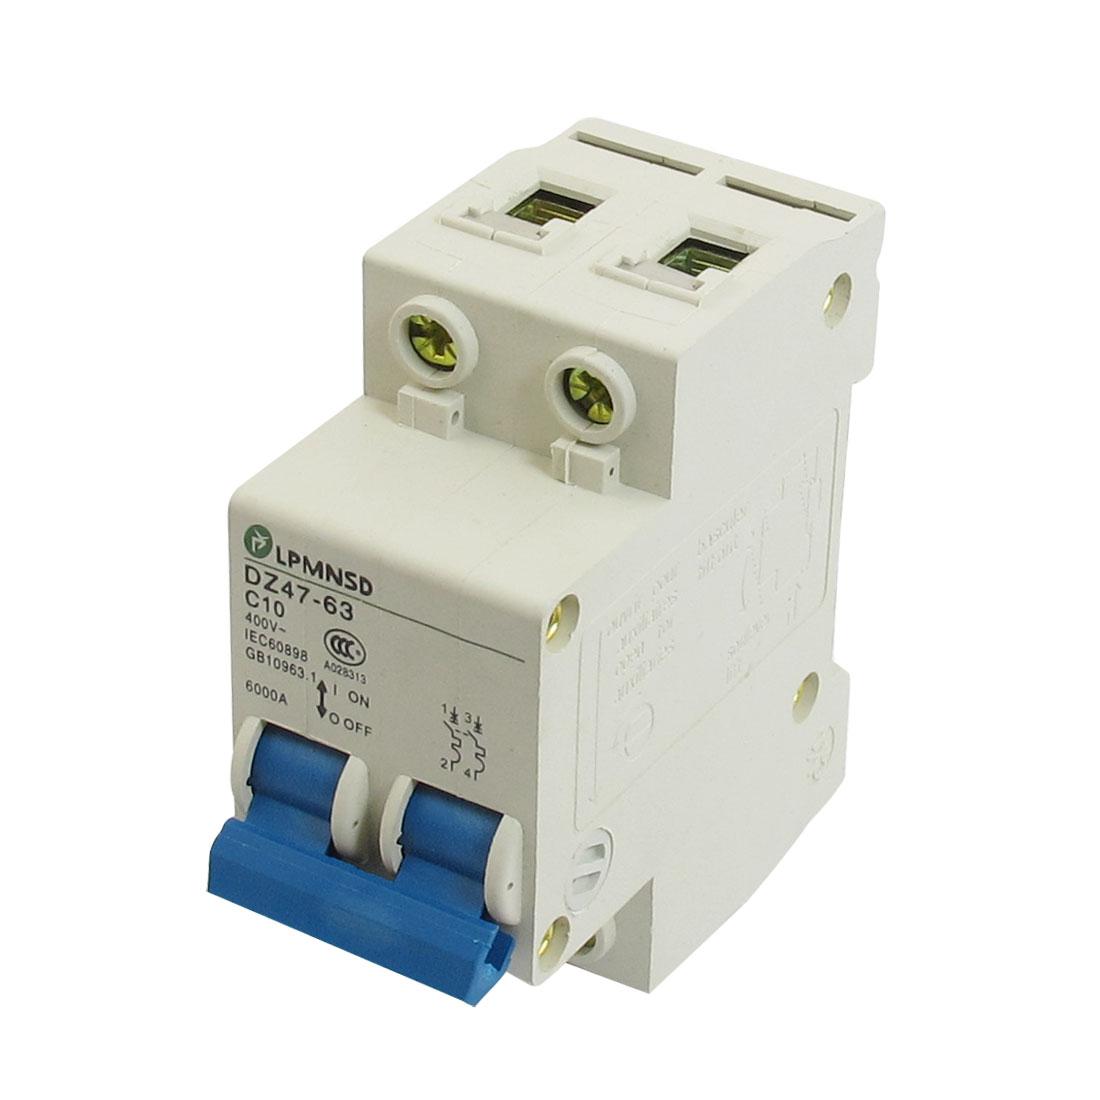 DZ47-63 C10 10A 400VAC 6000A Breaking Capacity 2 Poles Circuit Breaker